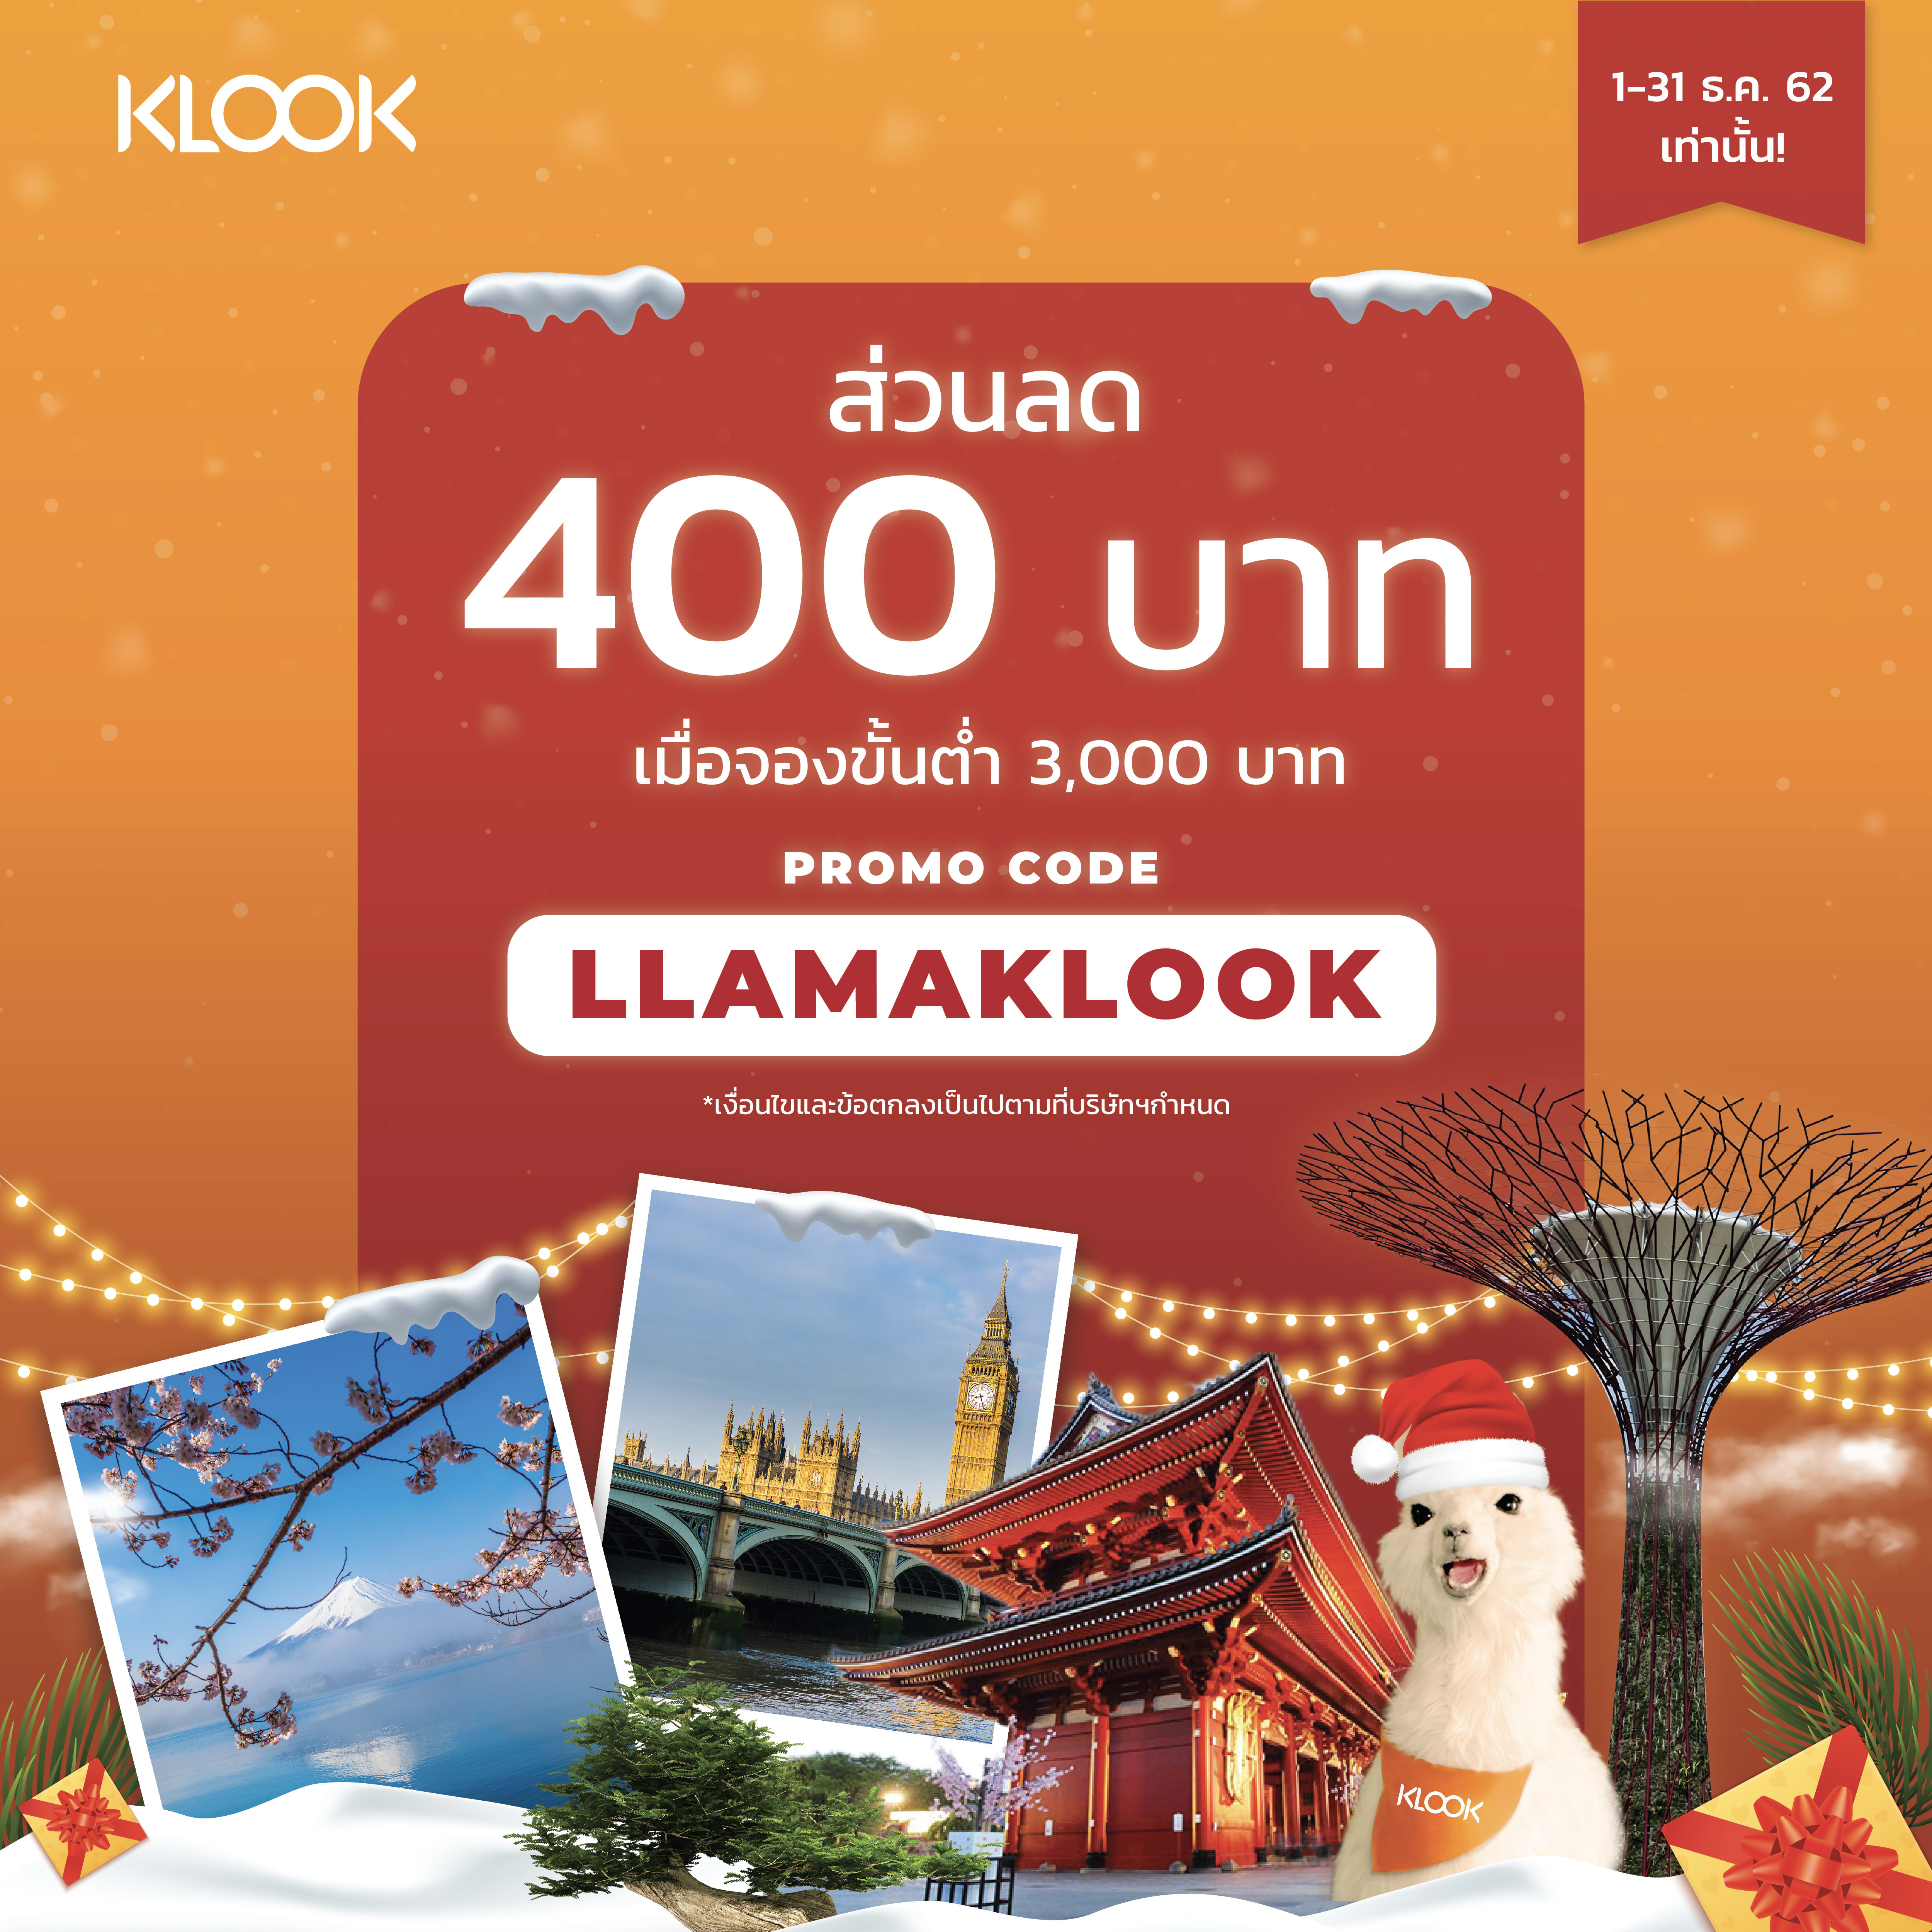 LLAMA-klook-promo